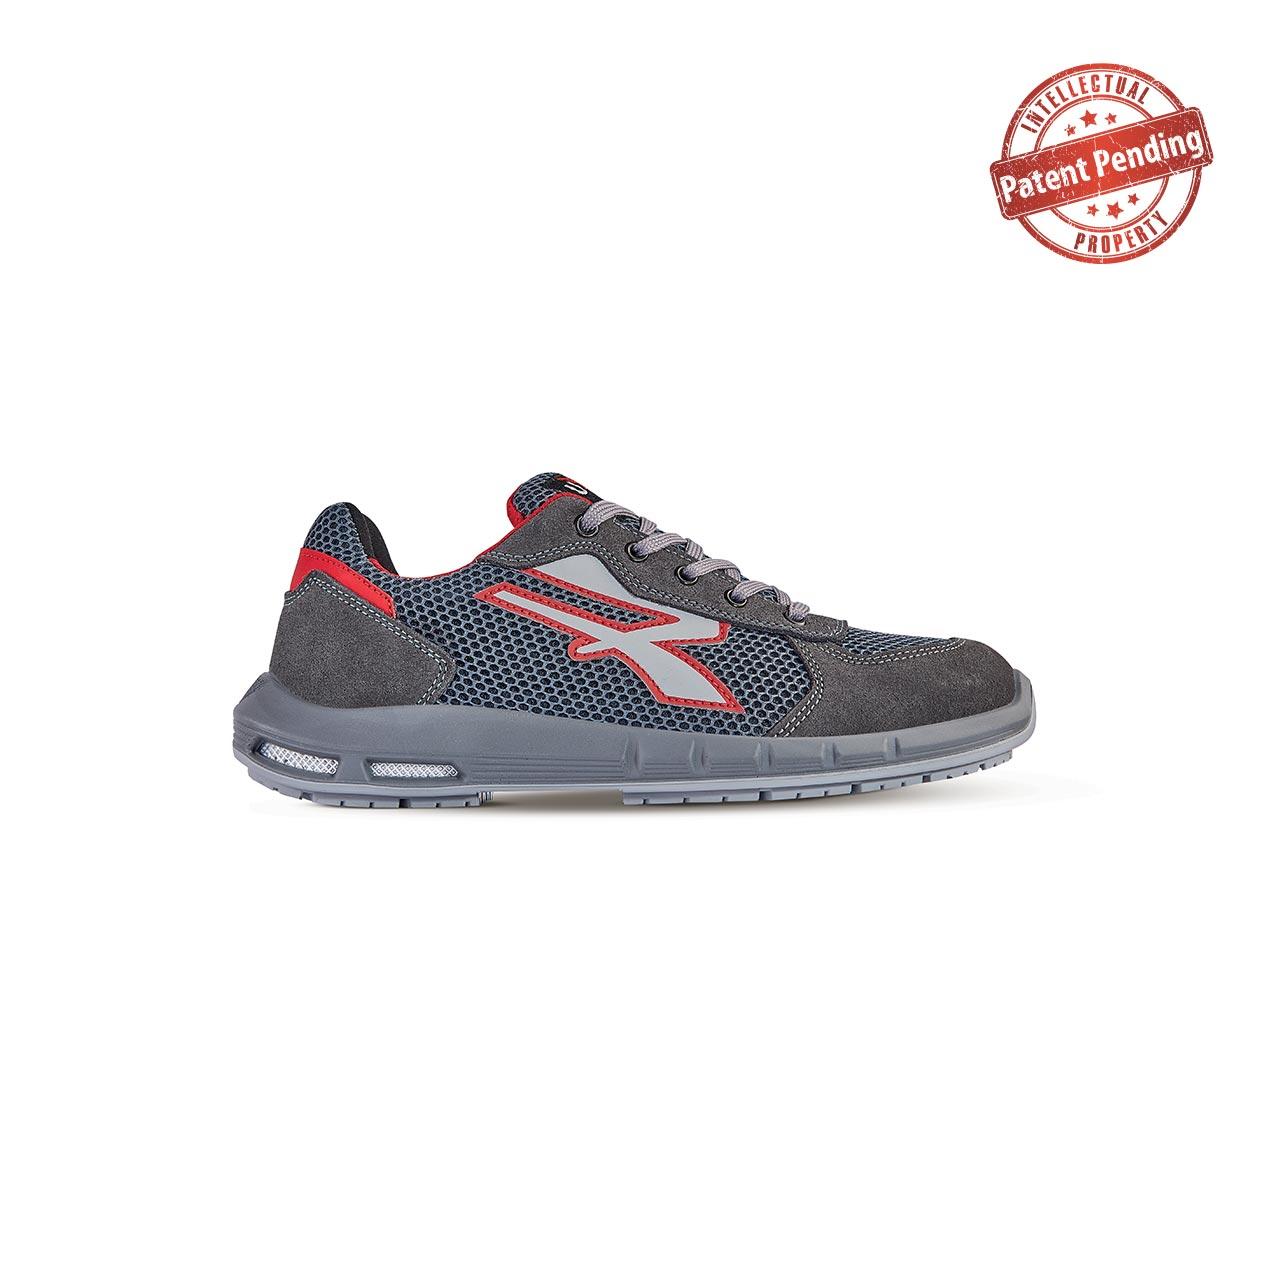 scarpa antinfortunistica upower modello skat plus linea redup plus vista laterale